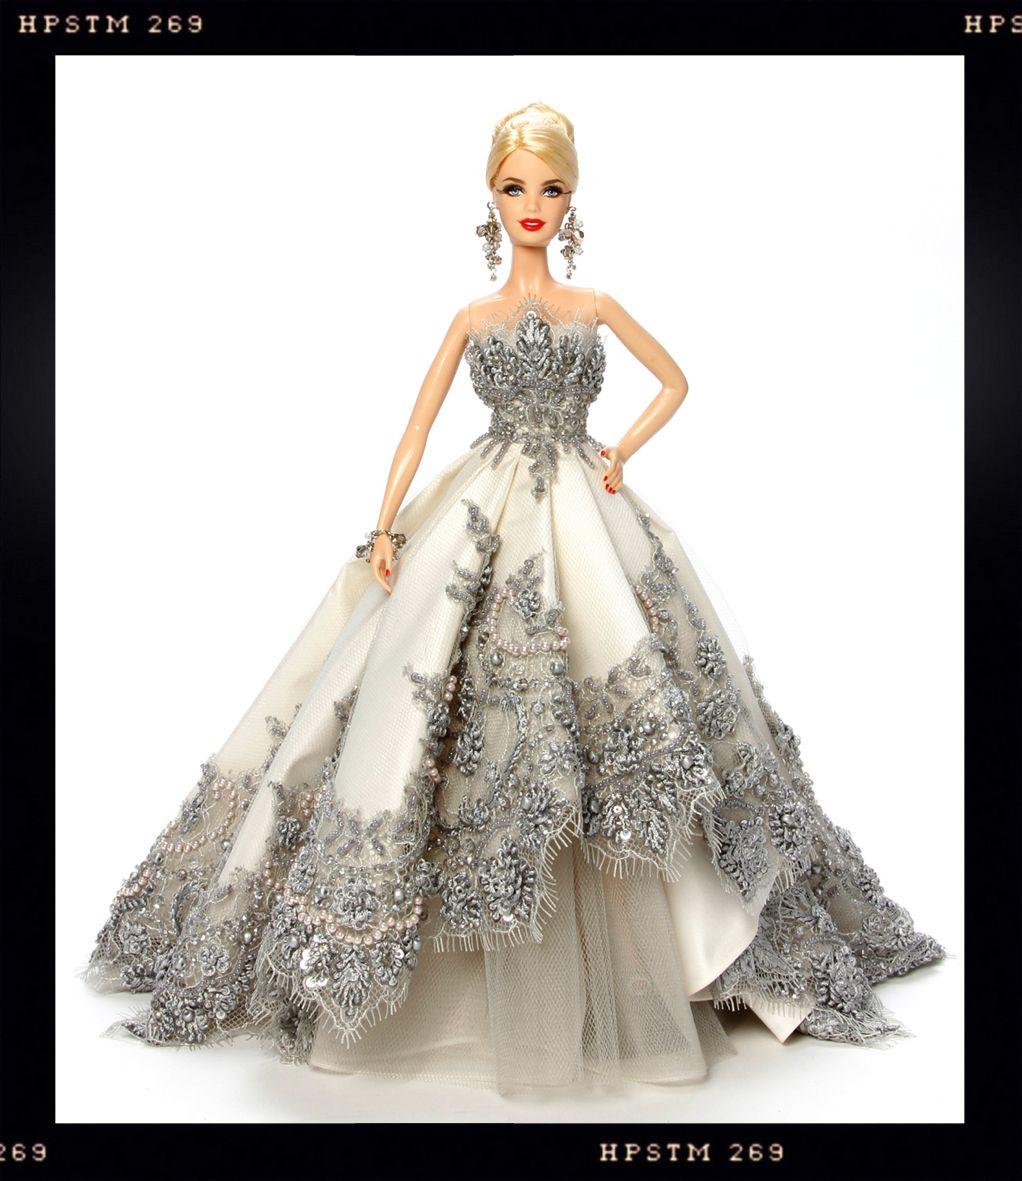 Barbie names 2014